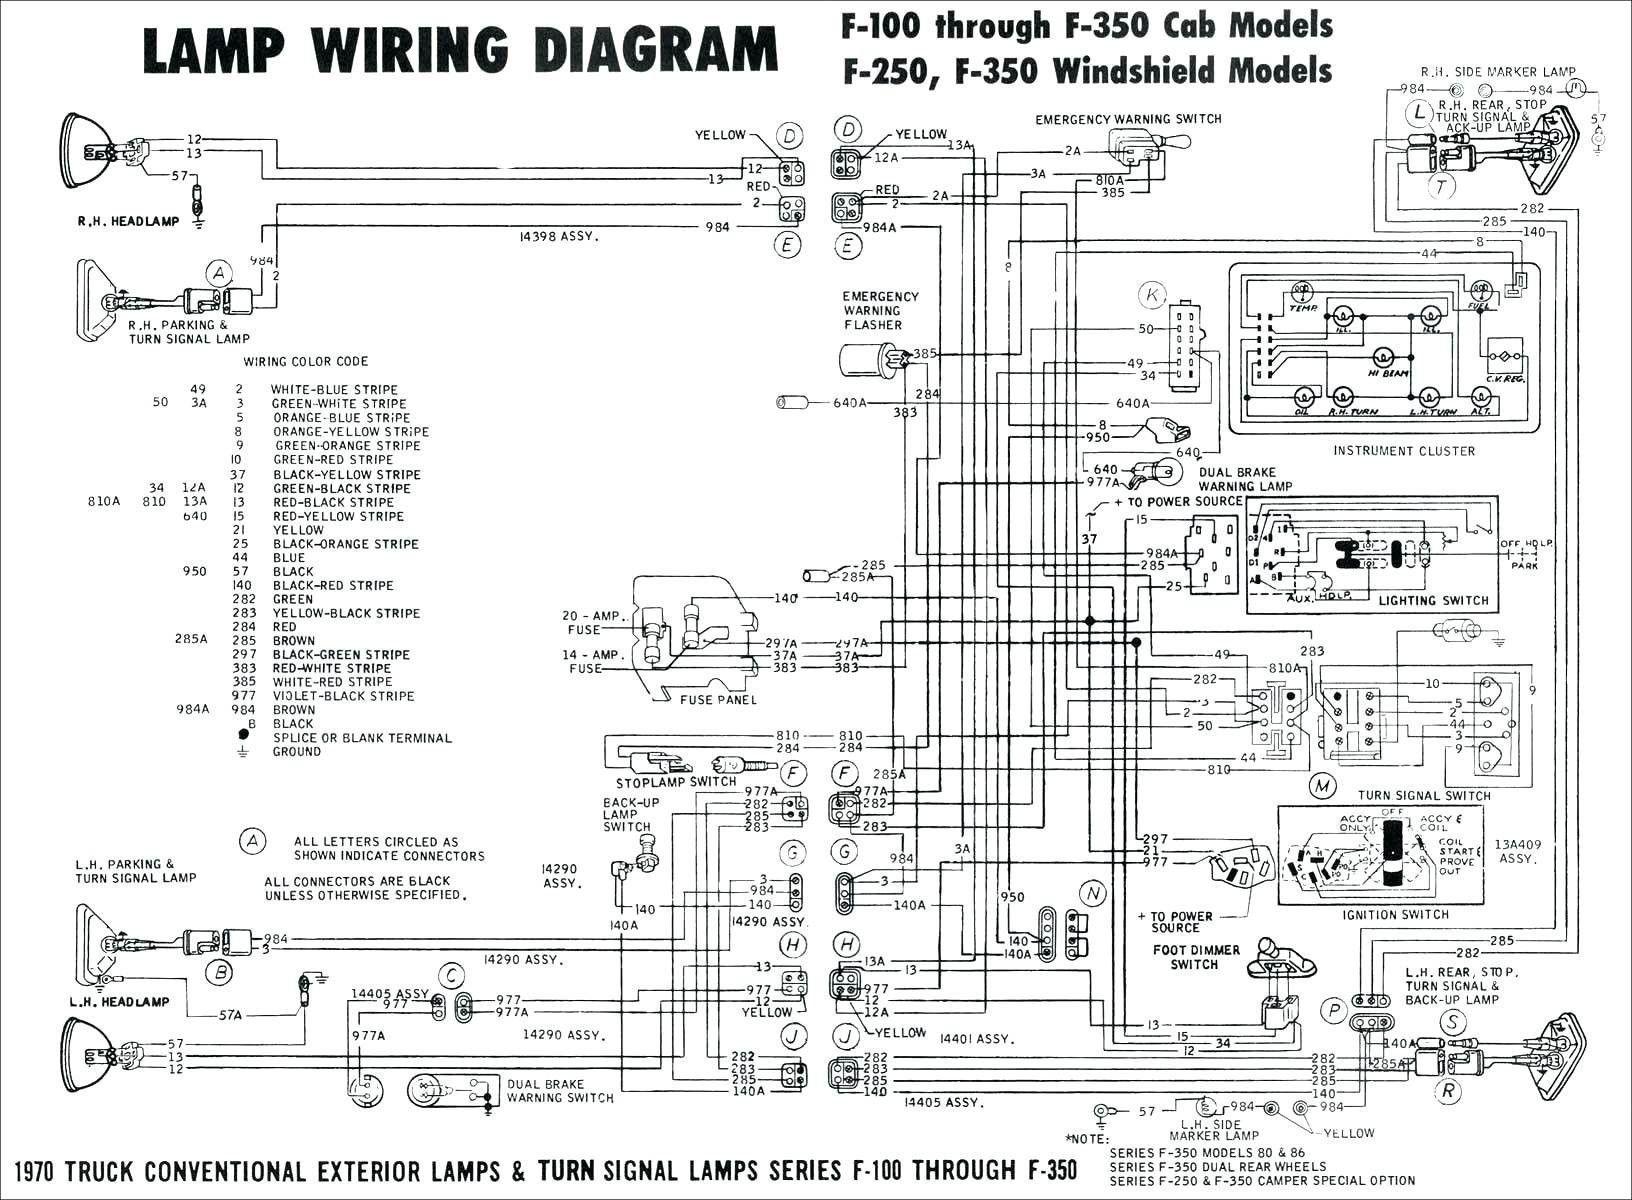 2005 Dodge Ram Infinity Radio Wiring Diagram In 2020 Trailer Wiring Diagram Electrical Wiring Diagram Circuit Diagram